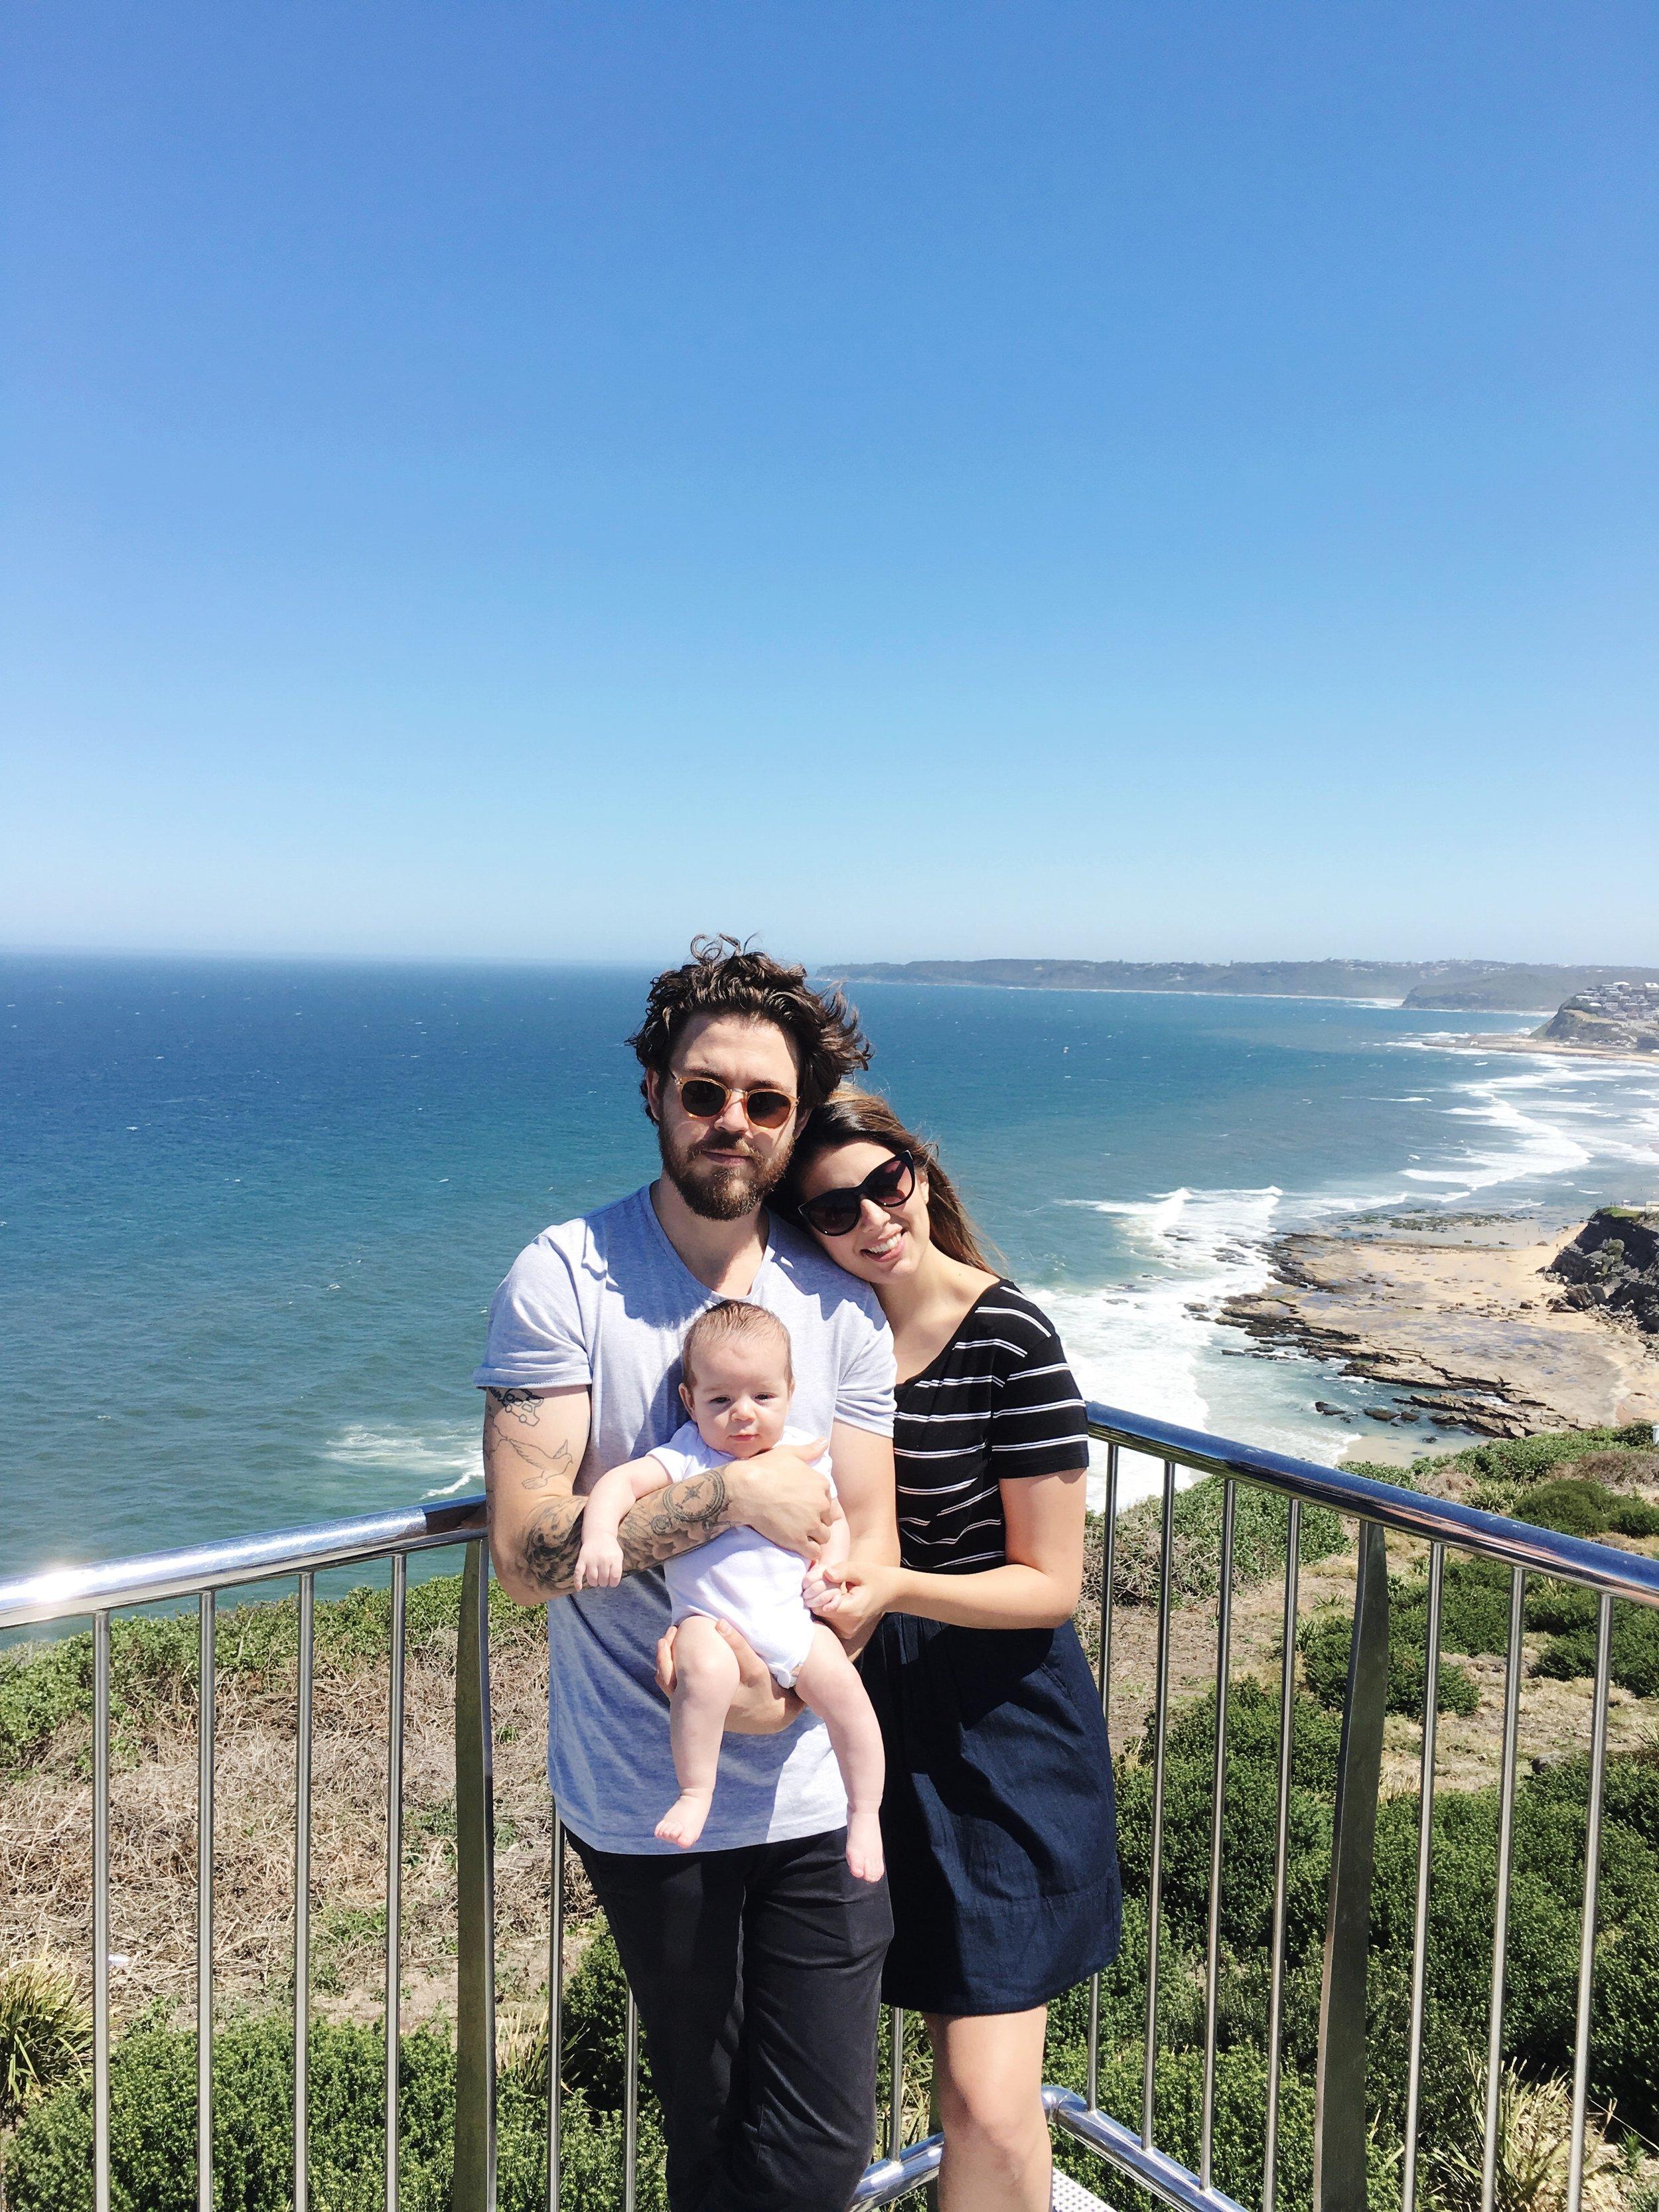 He saw the ocean in Australia before he did in California!